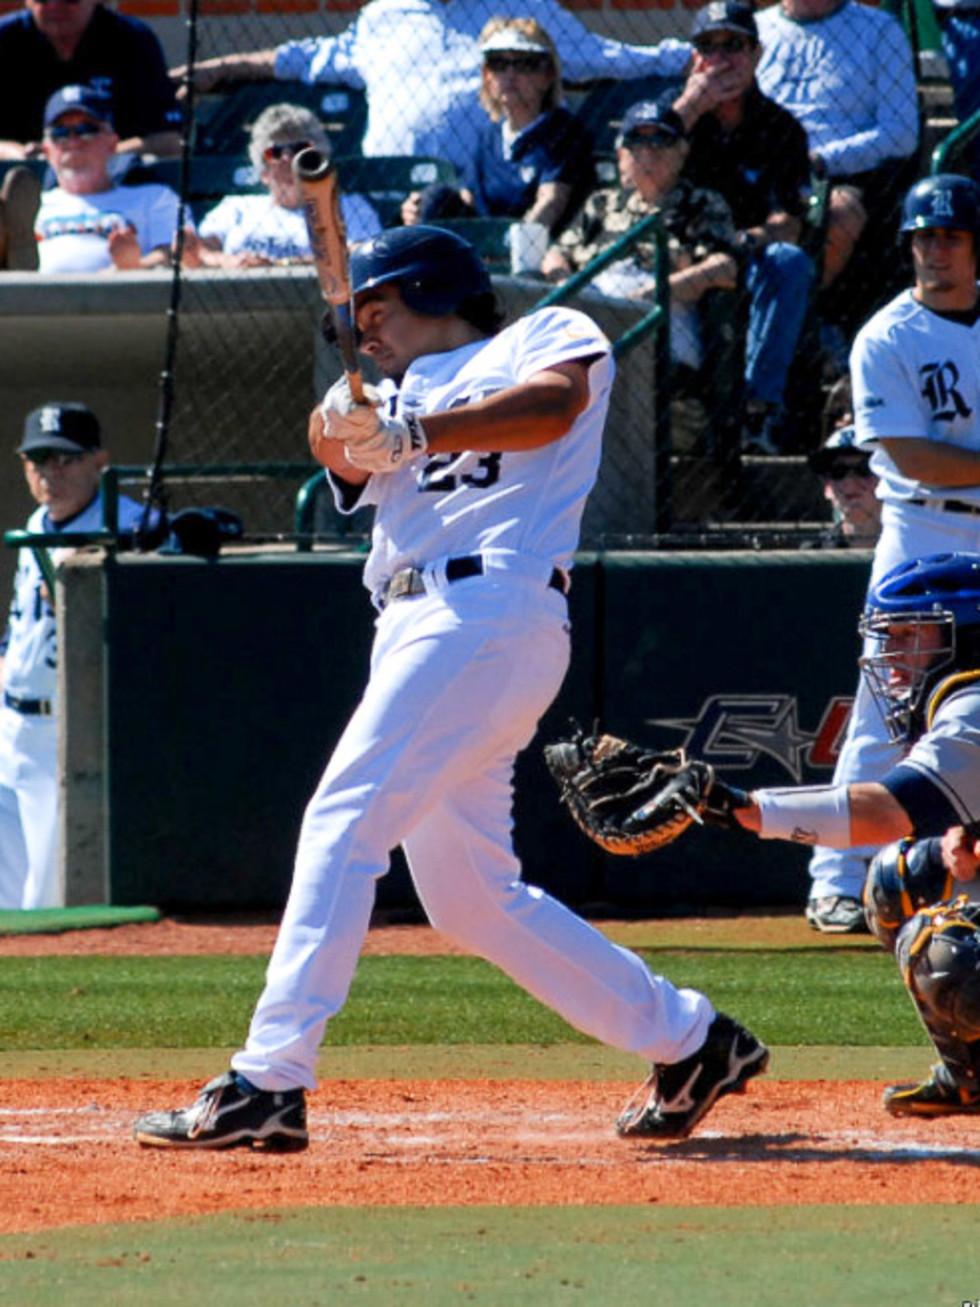 News_Anthony Rendon_Rice baseball_baseball player